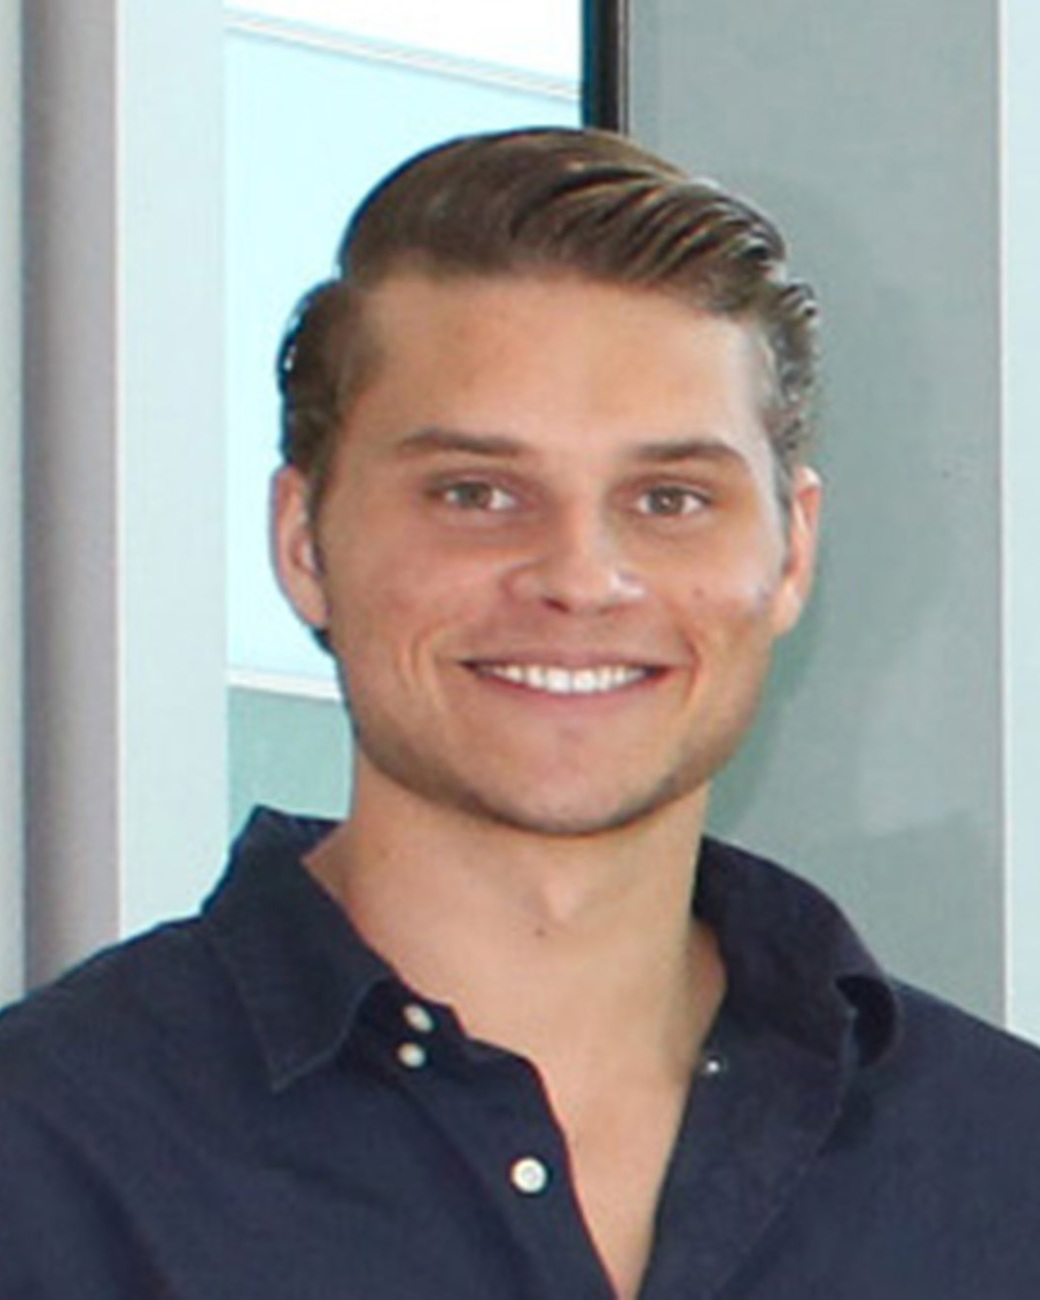 Gaston Bonenfant   Graduate Student  B.S., Cellular and Molecular Biology, Westmont College